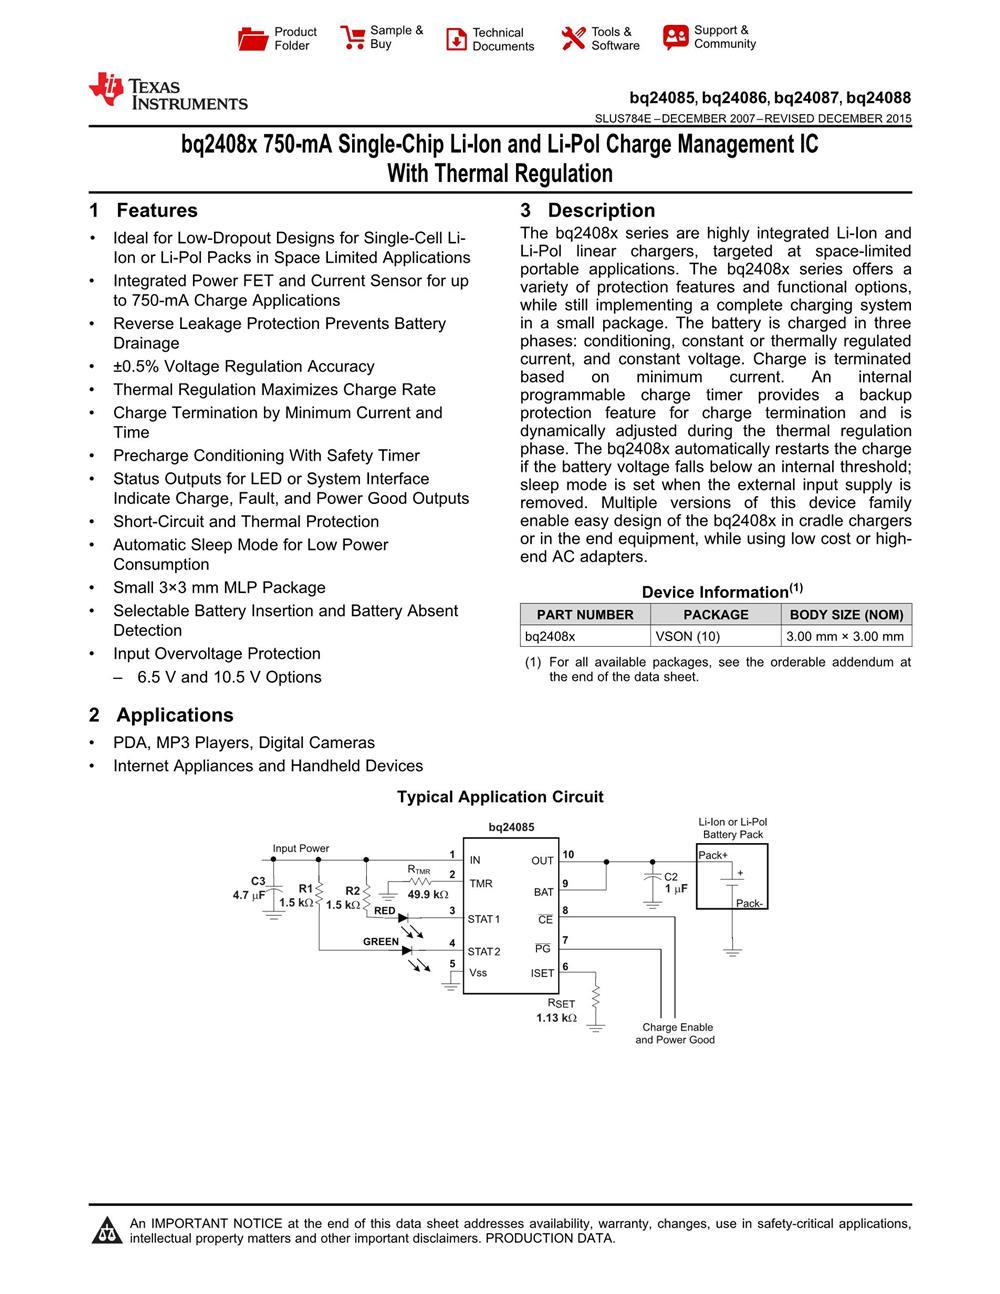 BQ24088DRCR's pdf picture 1